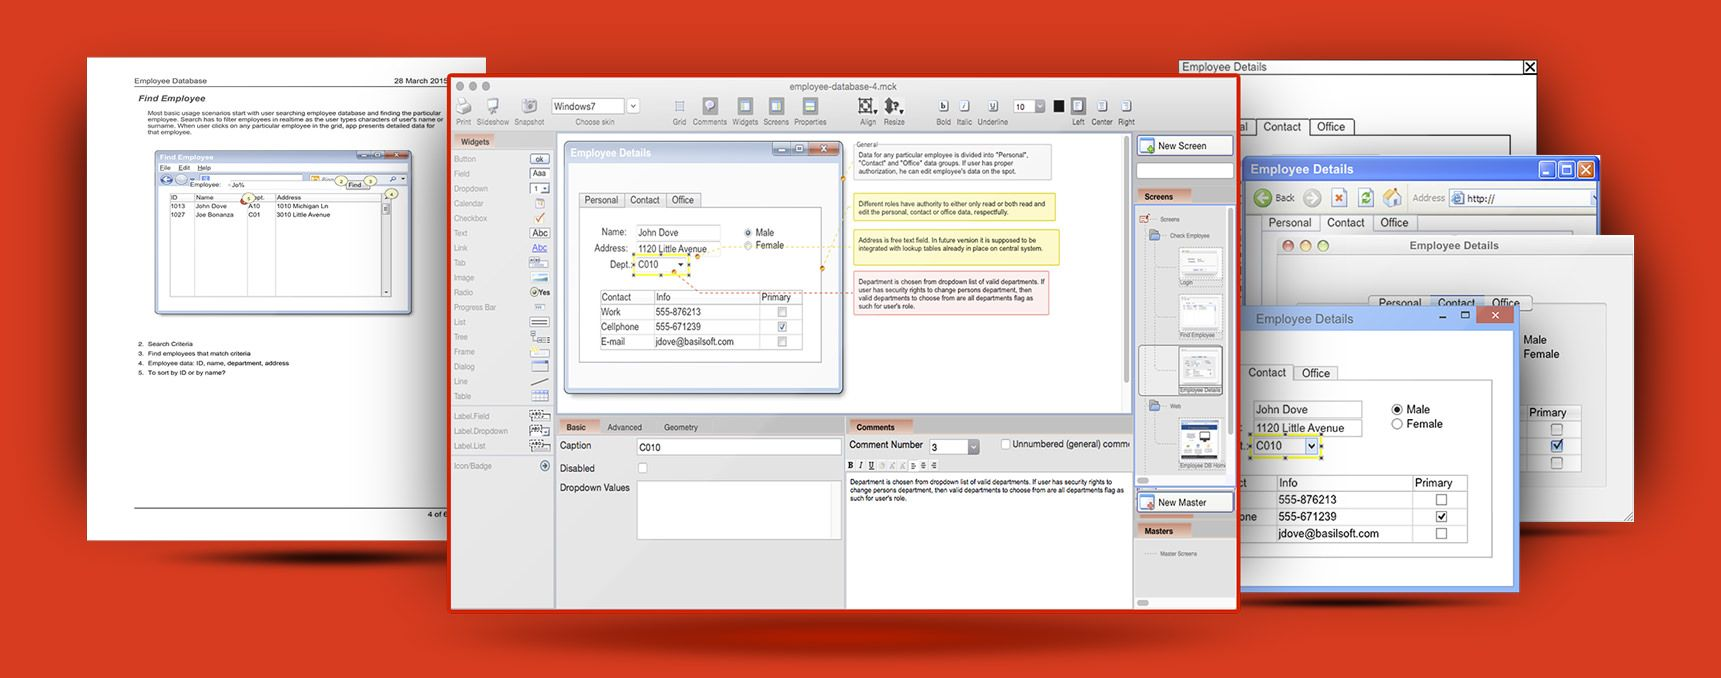 Convert pdf to jpegjpg with adobe acrobat mac guides pinterest convert pdf to jpegjpg with adobe acrobat mac guides pinterest adobe indesign fandeluxe Images